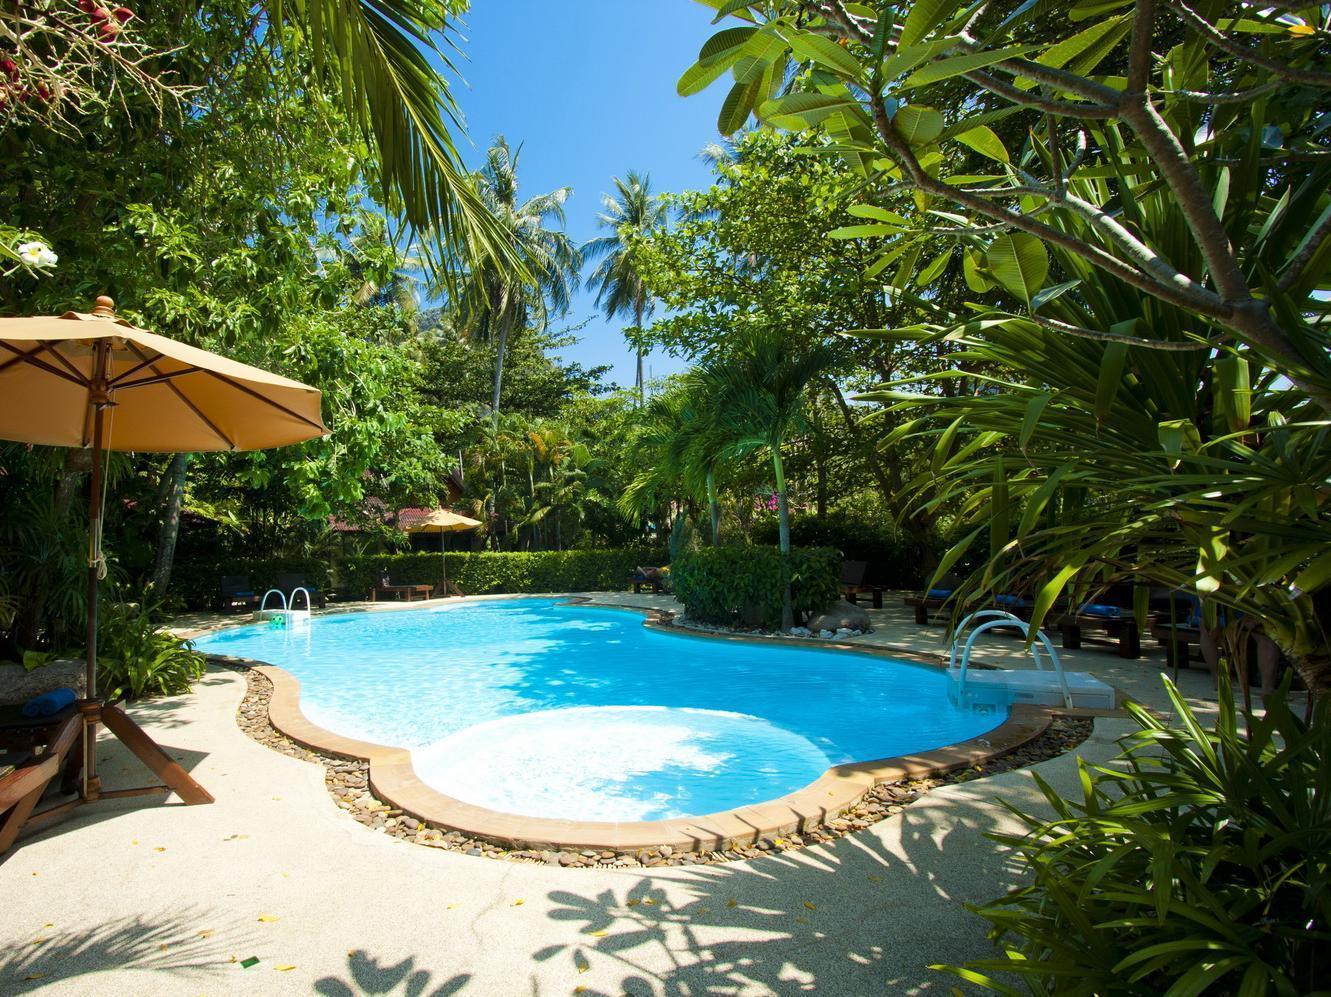 Sunrise Tropical Resort Krabi